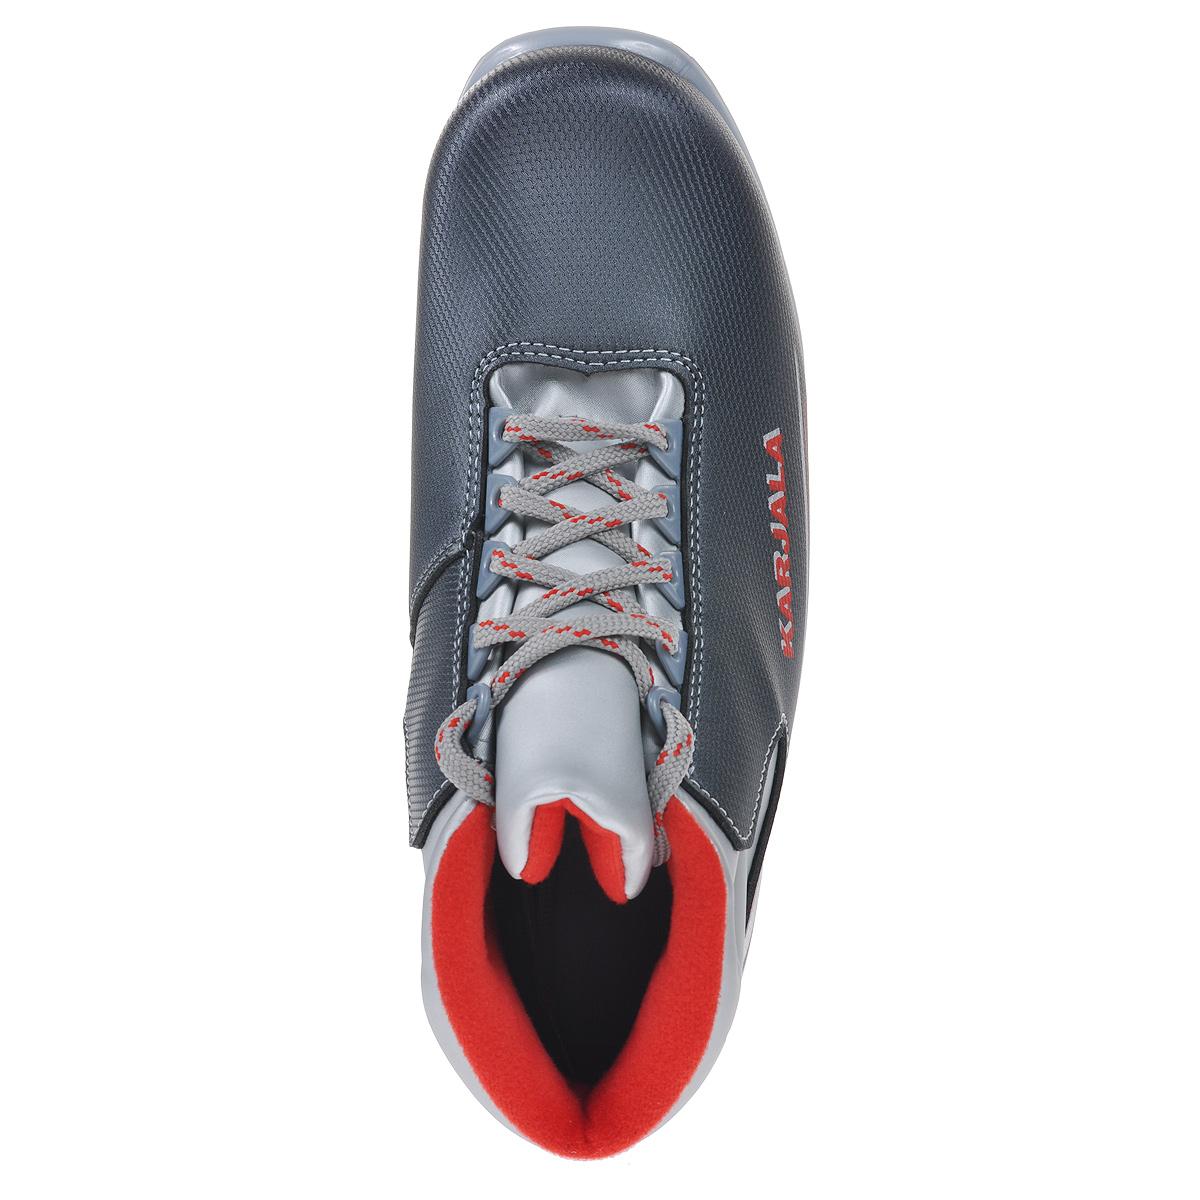 Ботинки для беговых лыж Cruiser NNN ( Cruiser NNN_черный )